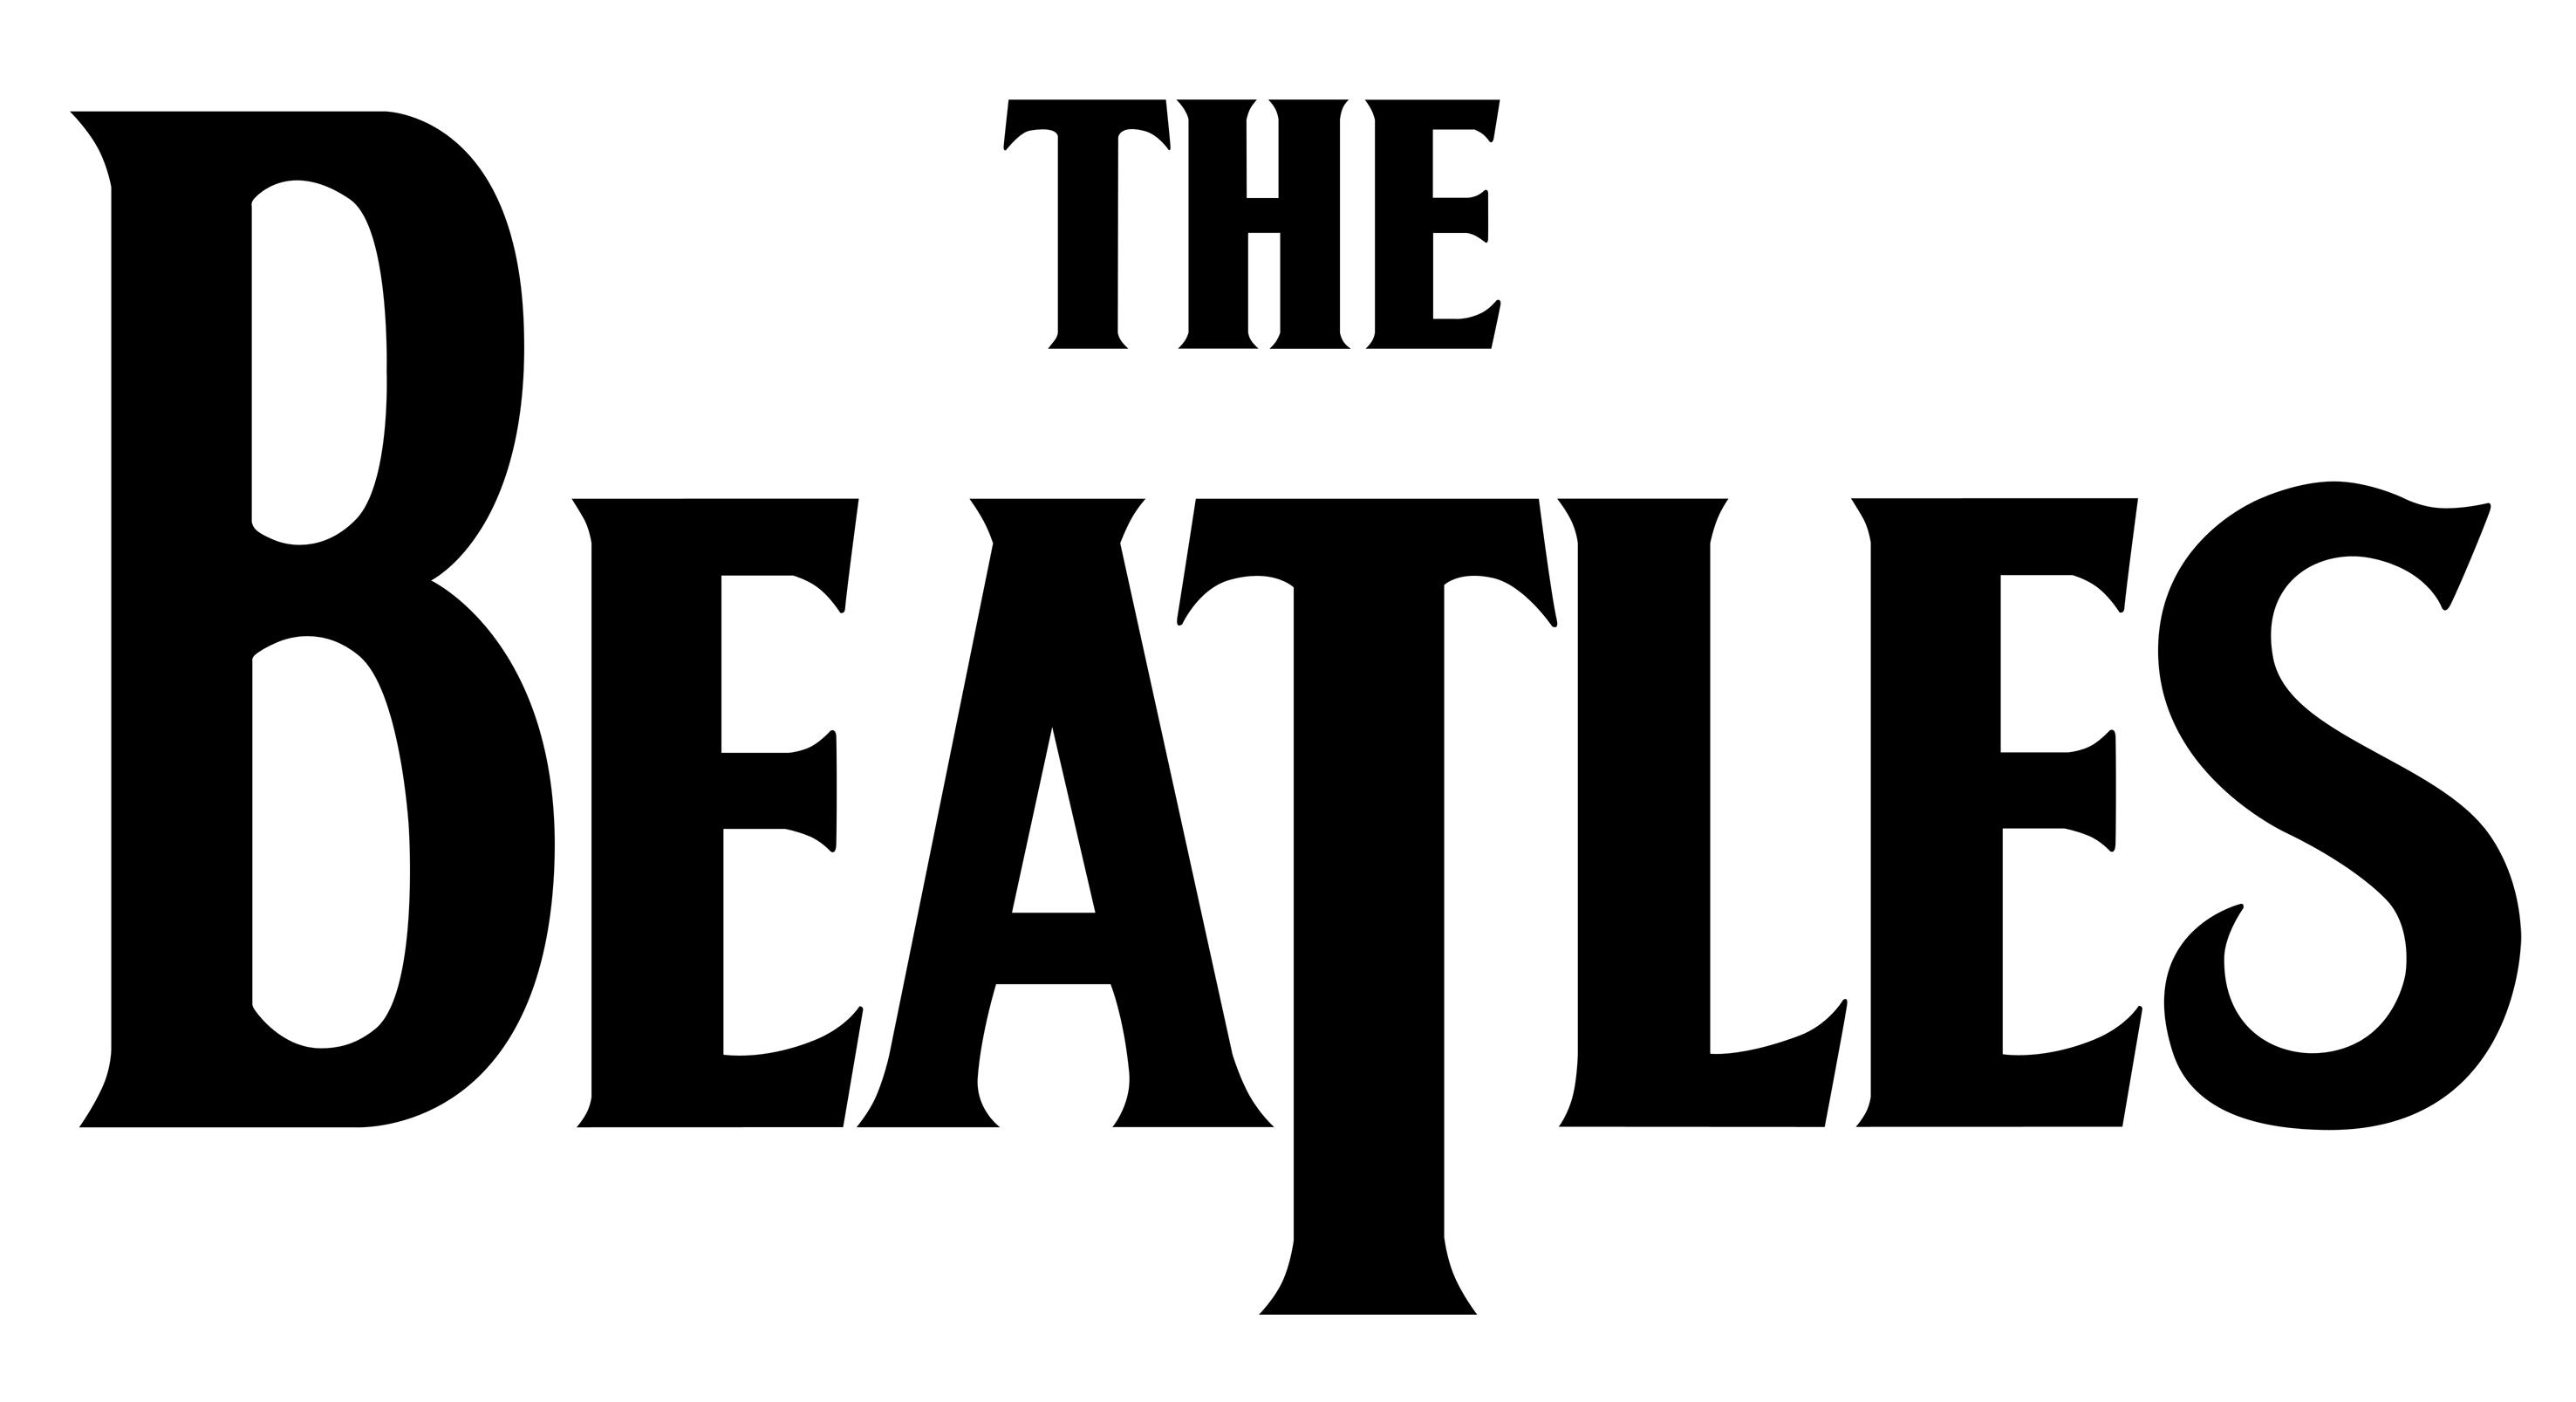 Beatles clip art.